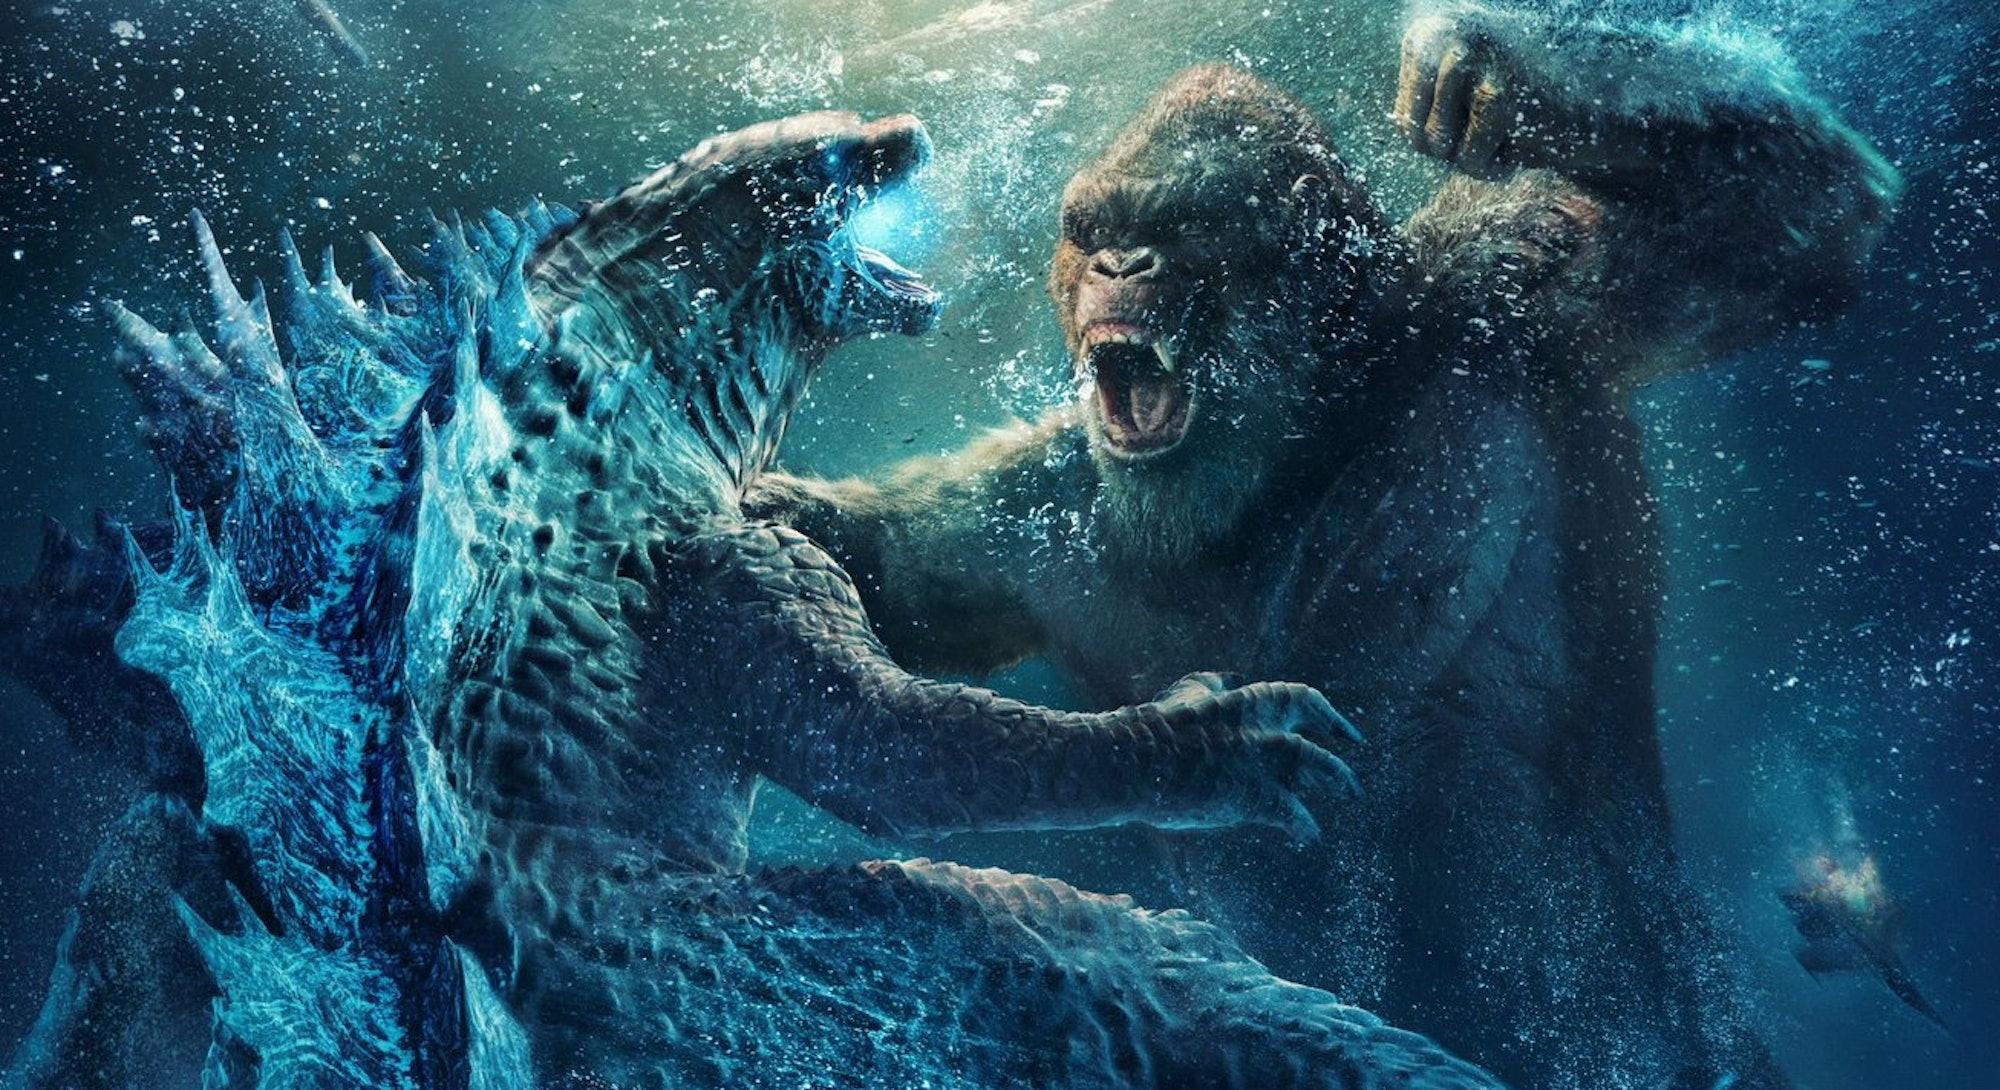 godzilla and king kong fighting underwater